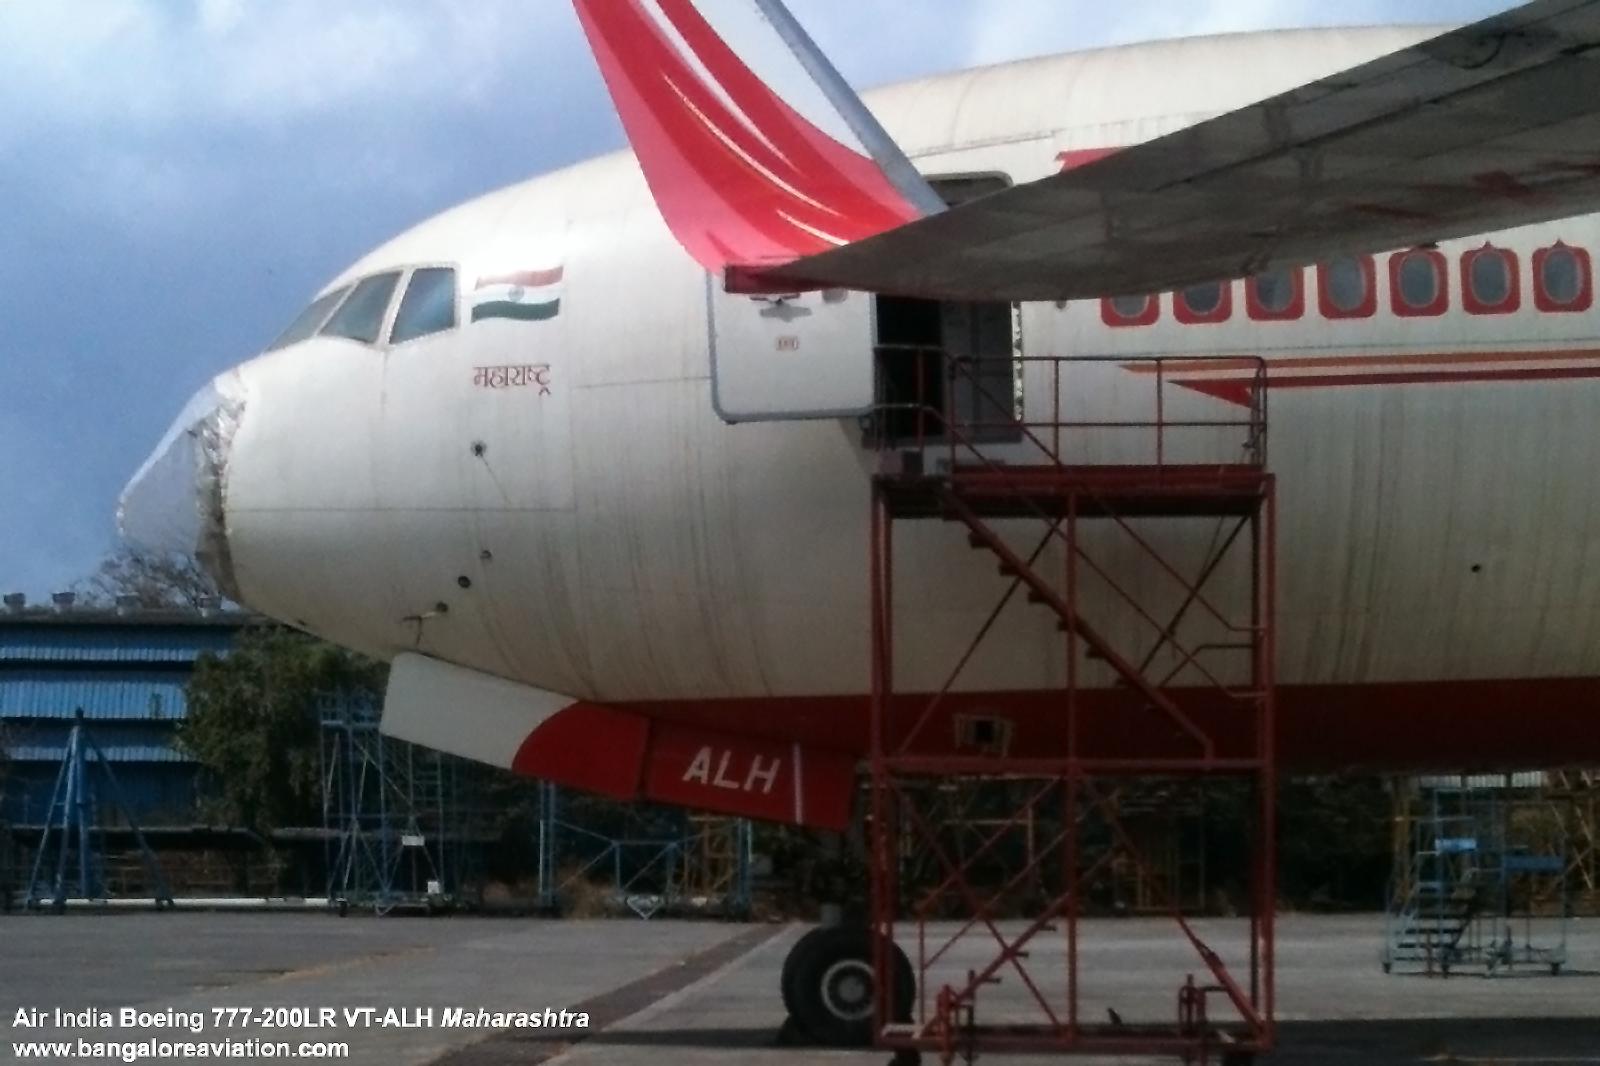 http://www.bangaloreaviation.com/wp-content/uploads/2014/03/VT-ALH_Maharashtra_Cannibalised_Air_India_Boeing_777-200LR_2.jpg